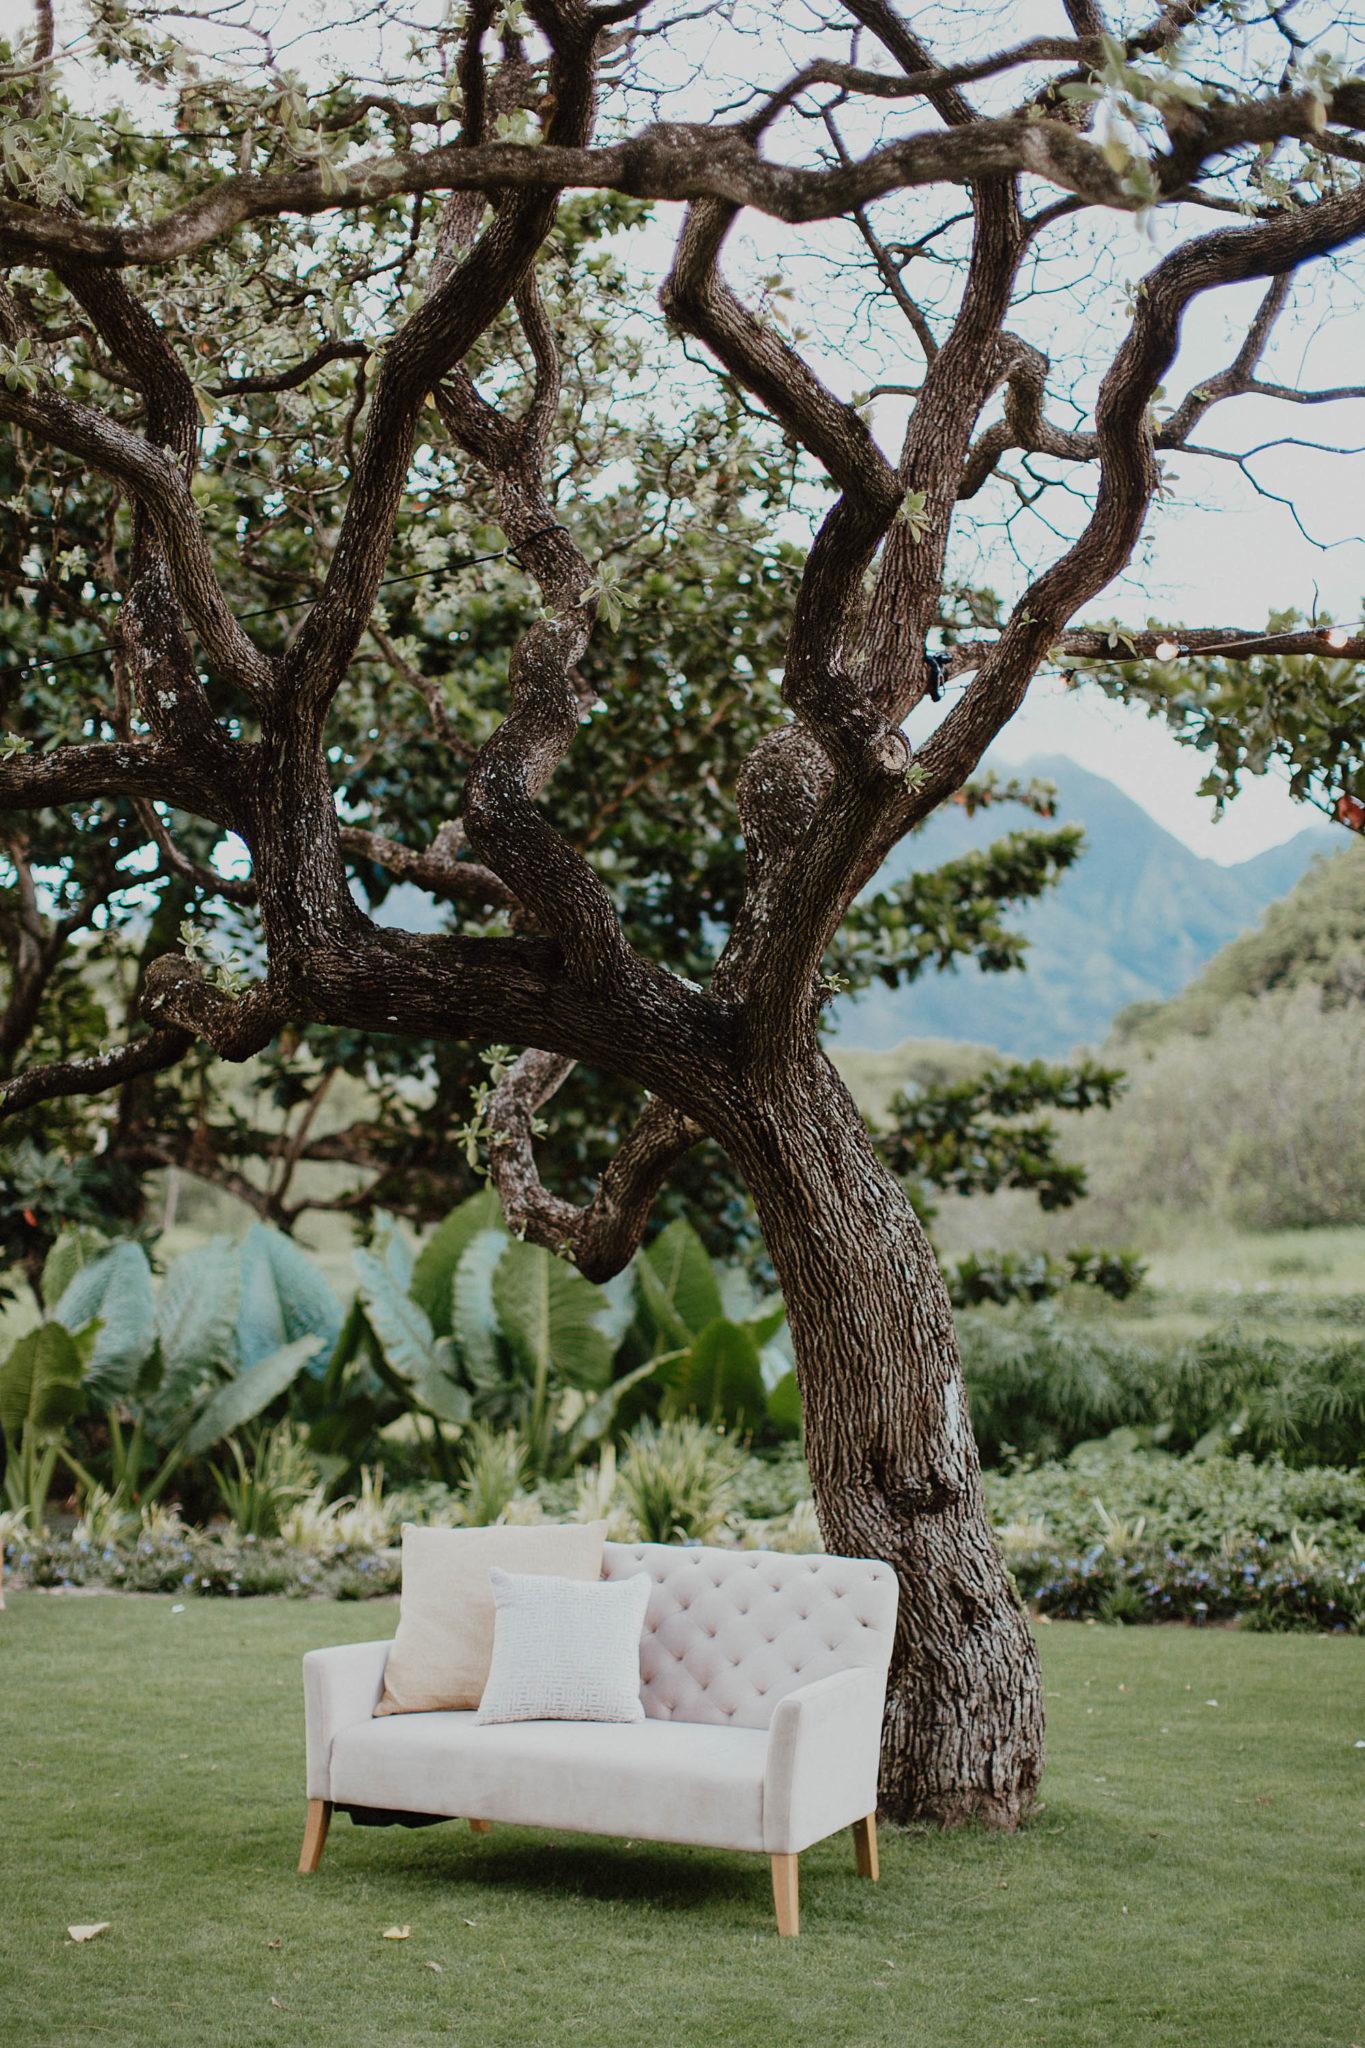 Blush couches on destination wedding in kauai